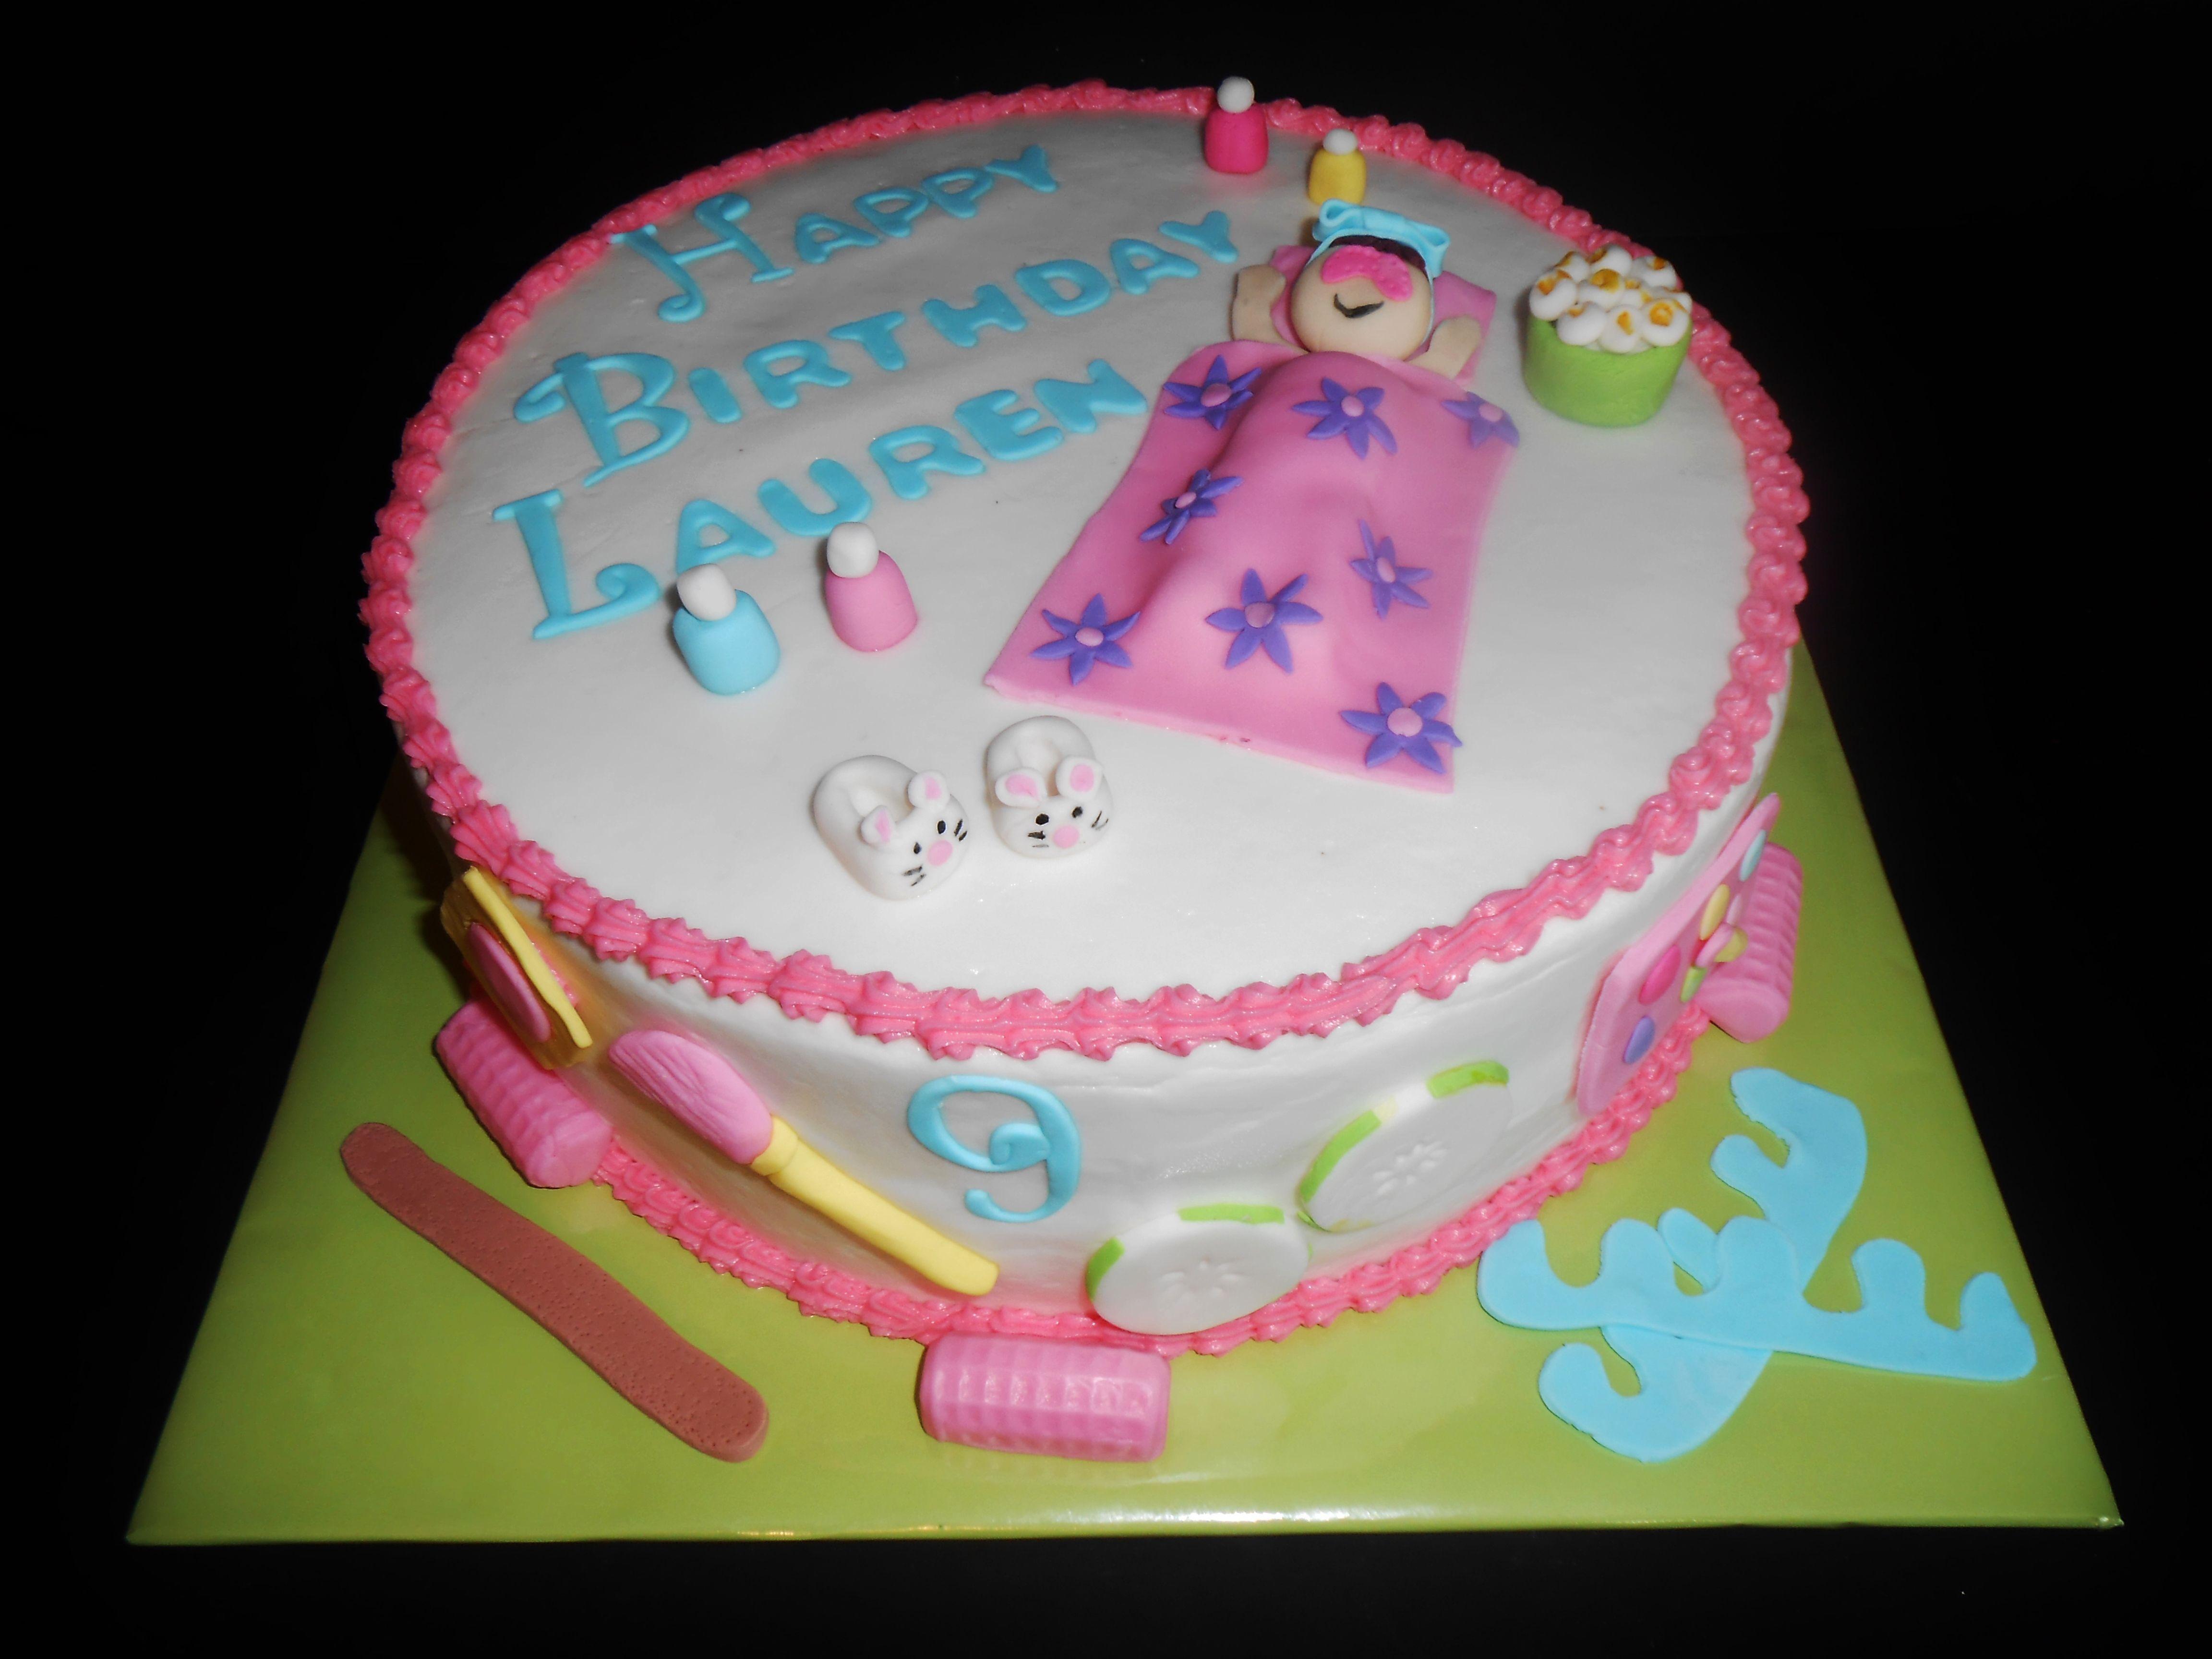 SLUMBERSPA PARTY CAKE Slumber Party Pinterest Spa Party - Spa birthday party cake